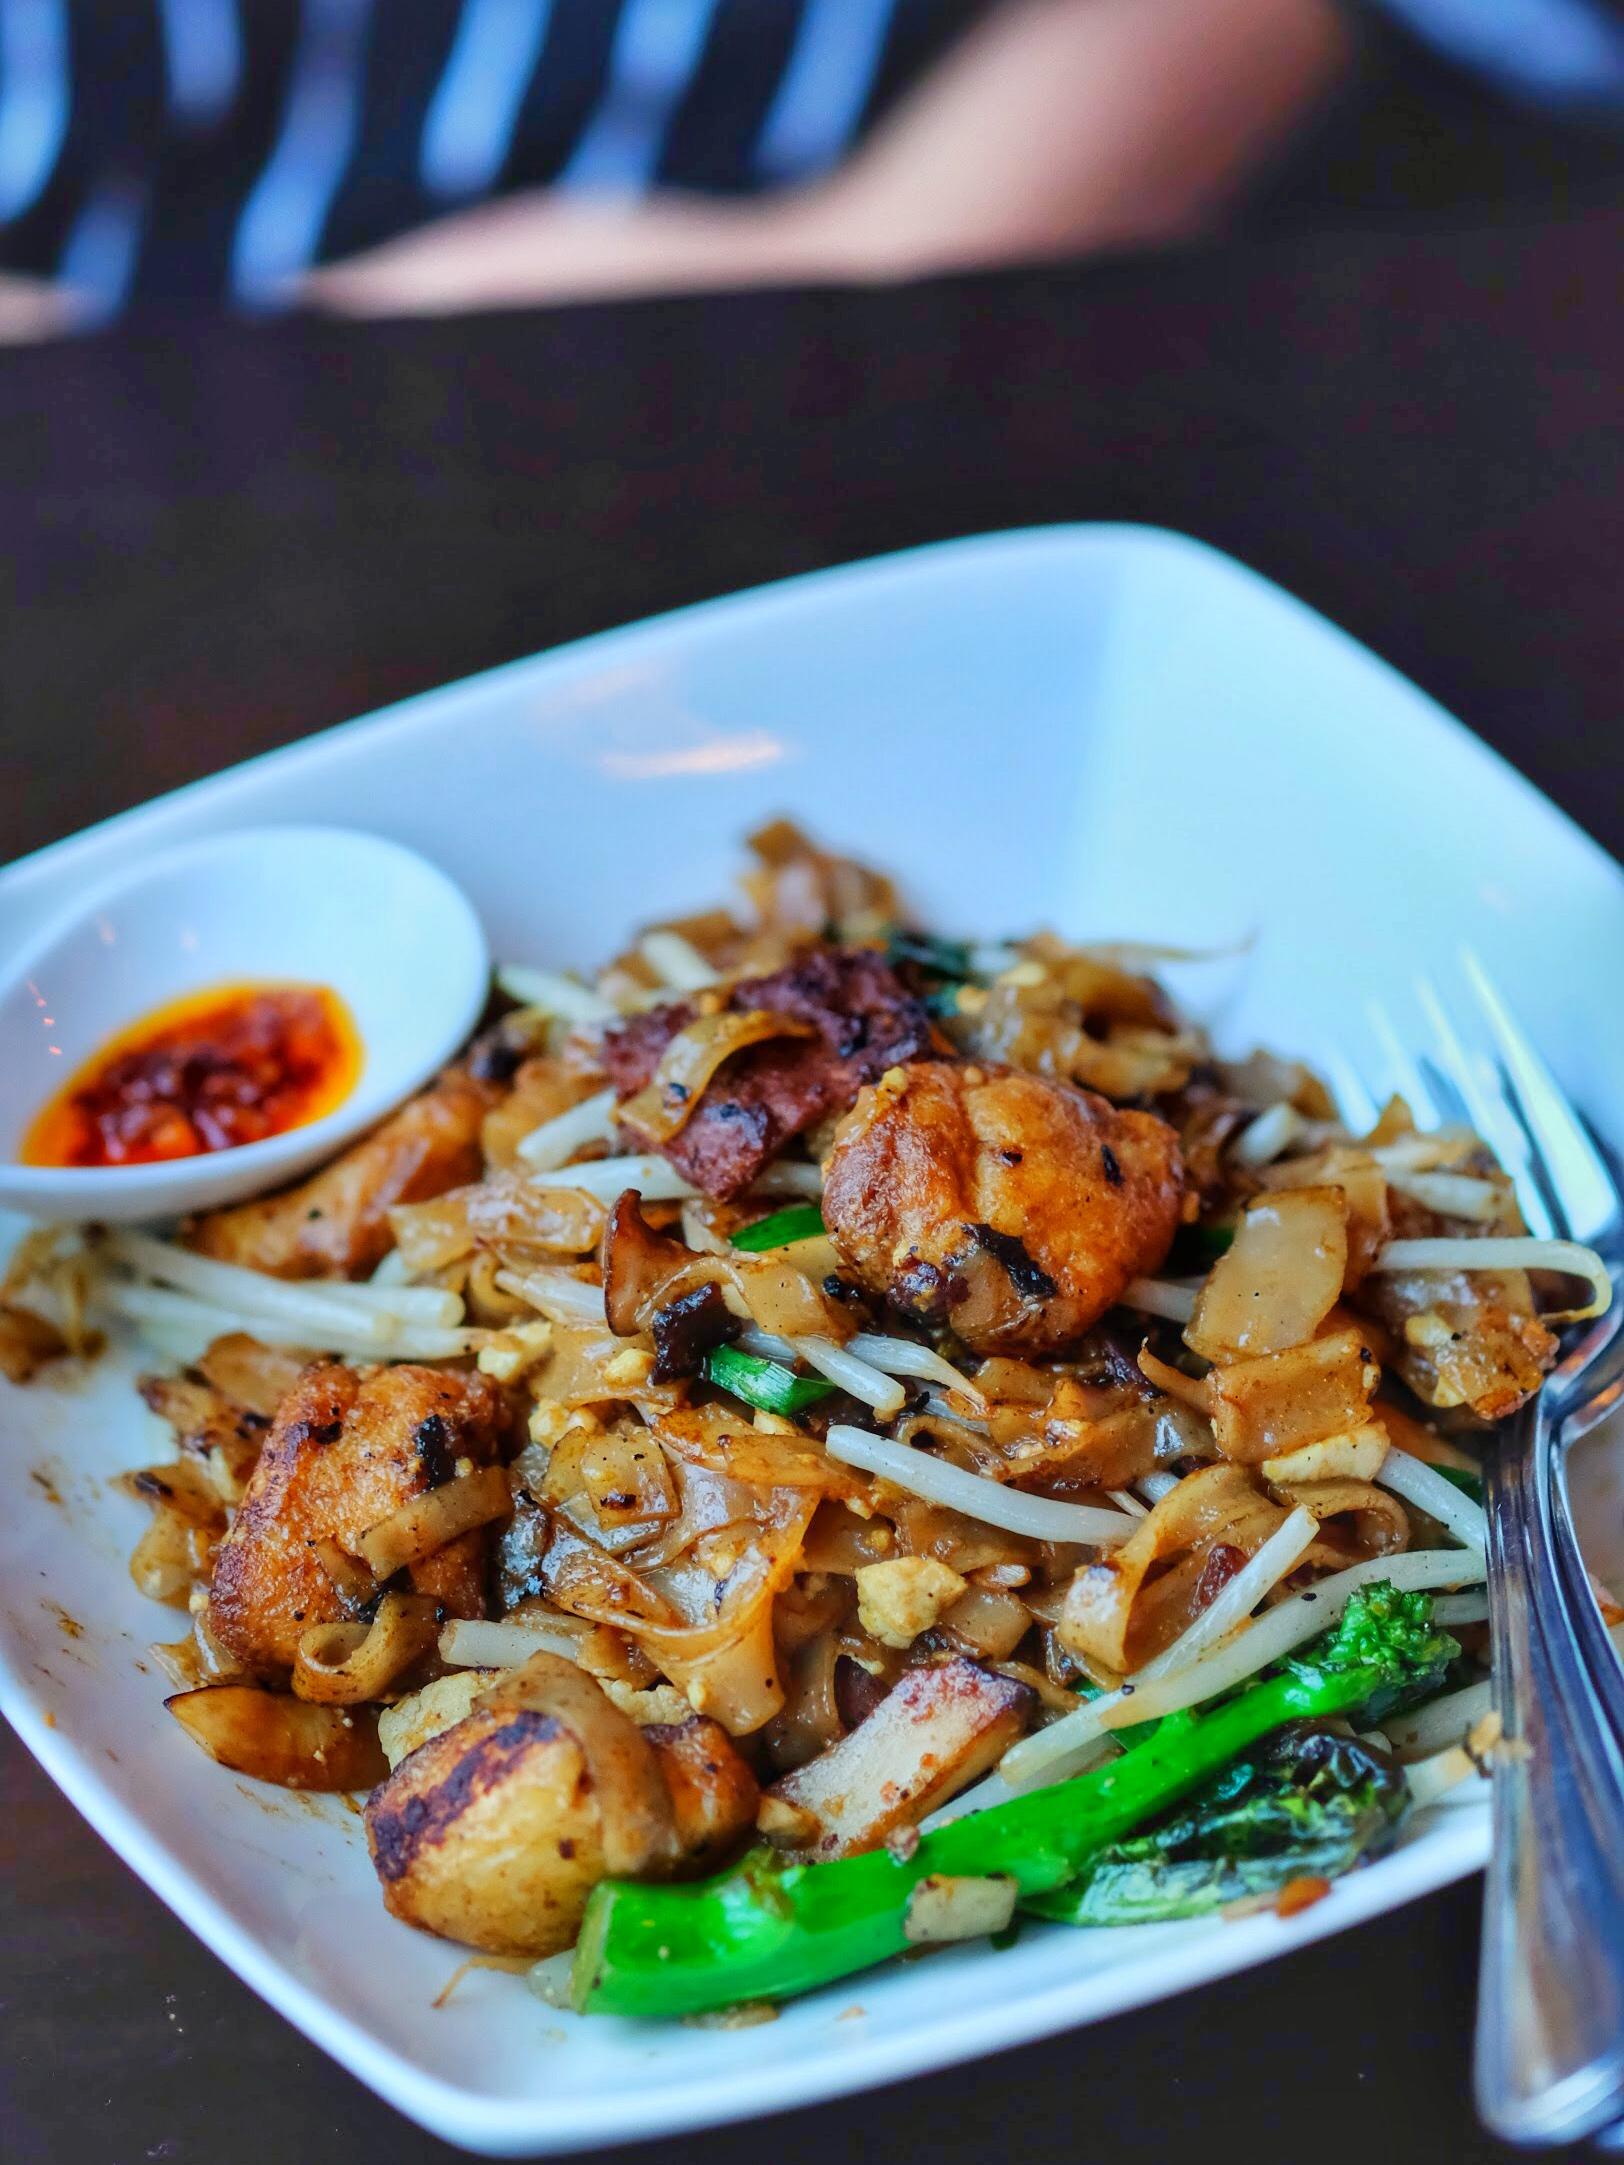 Char Kwan Teow (stir fried noodles)